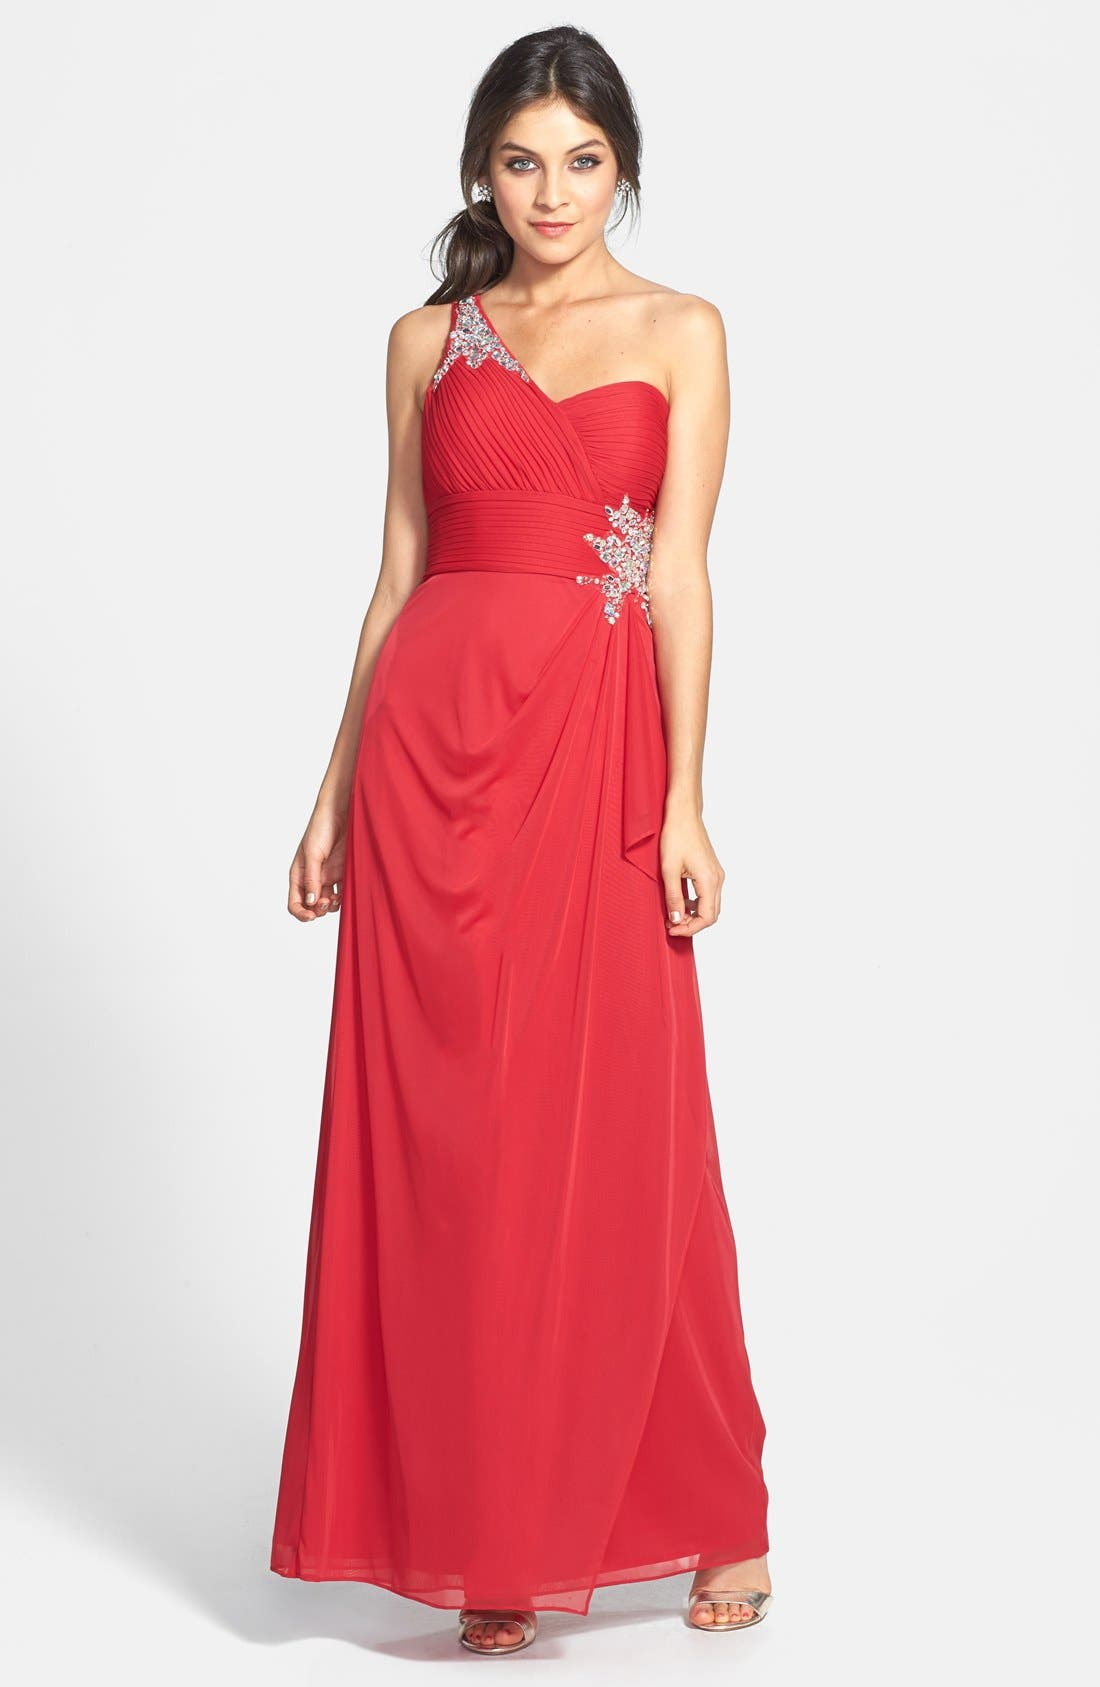 Alternate Image 1 Selected - Xscape Embellished One-Shoulder Gown